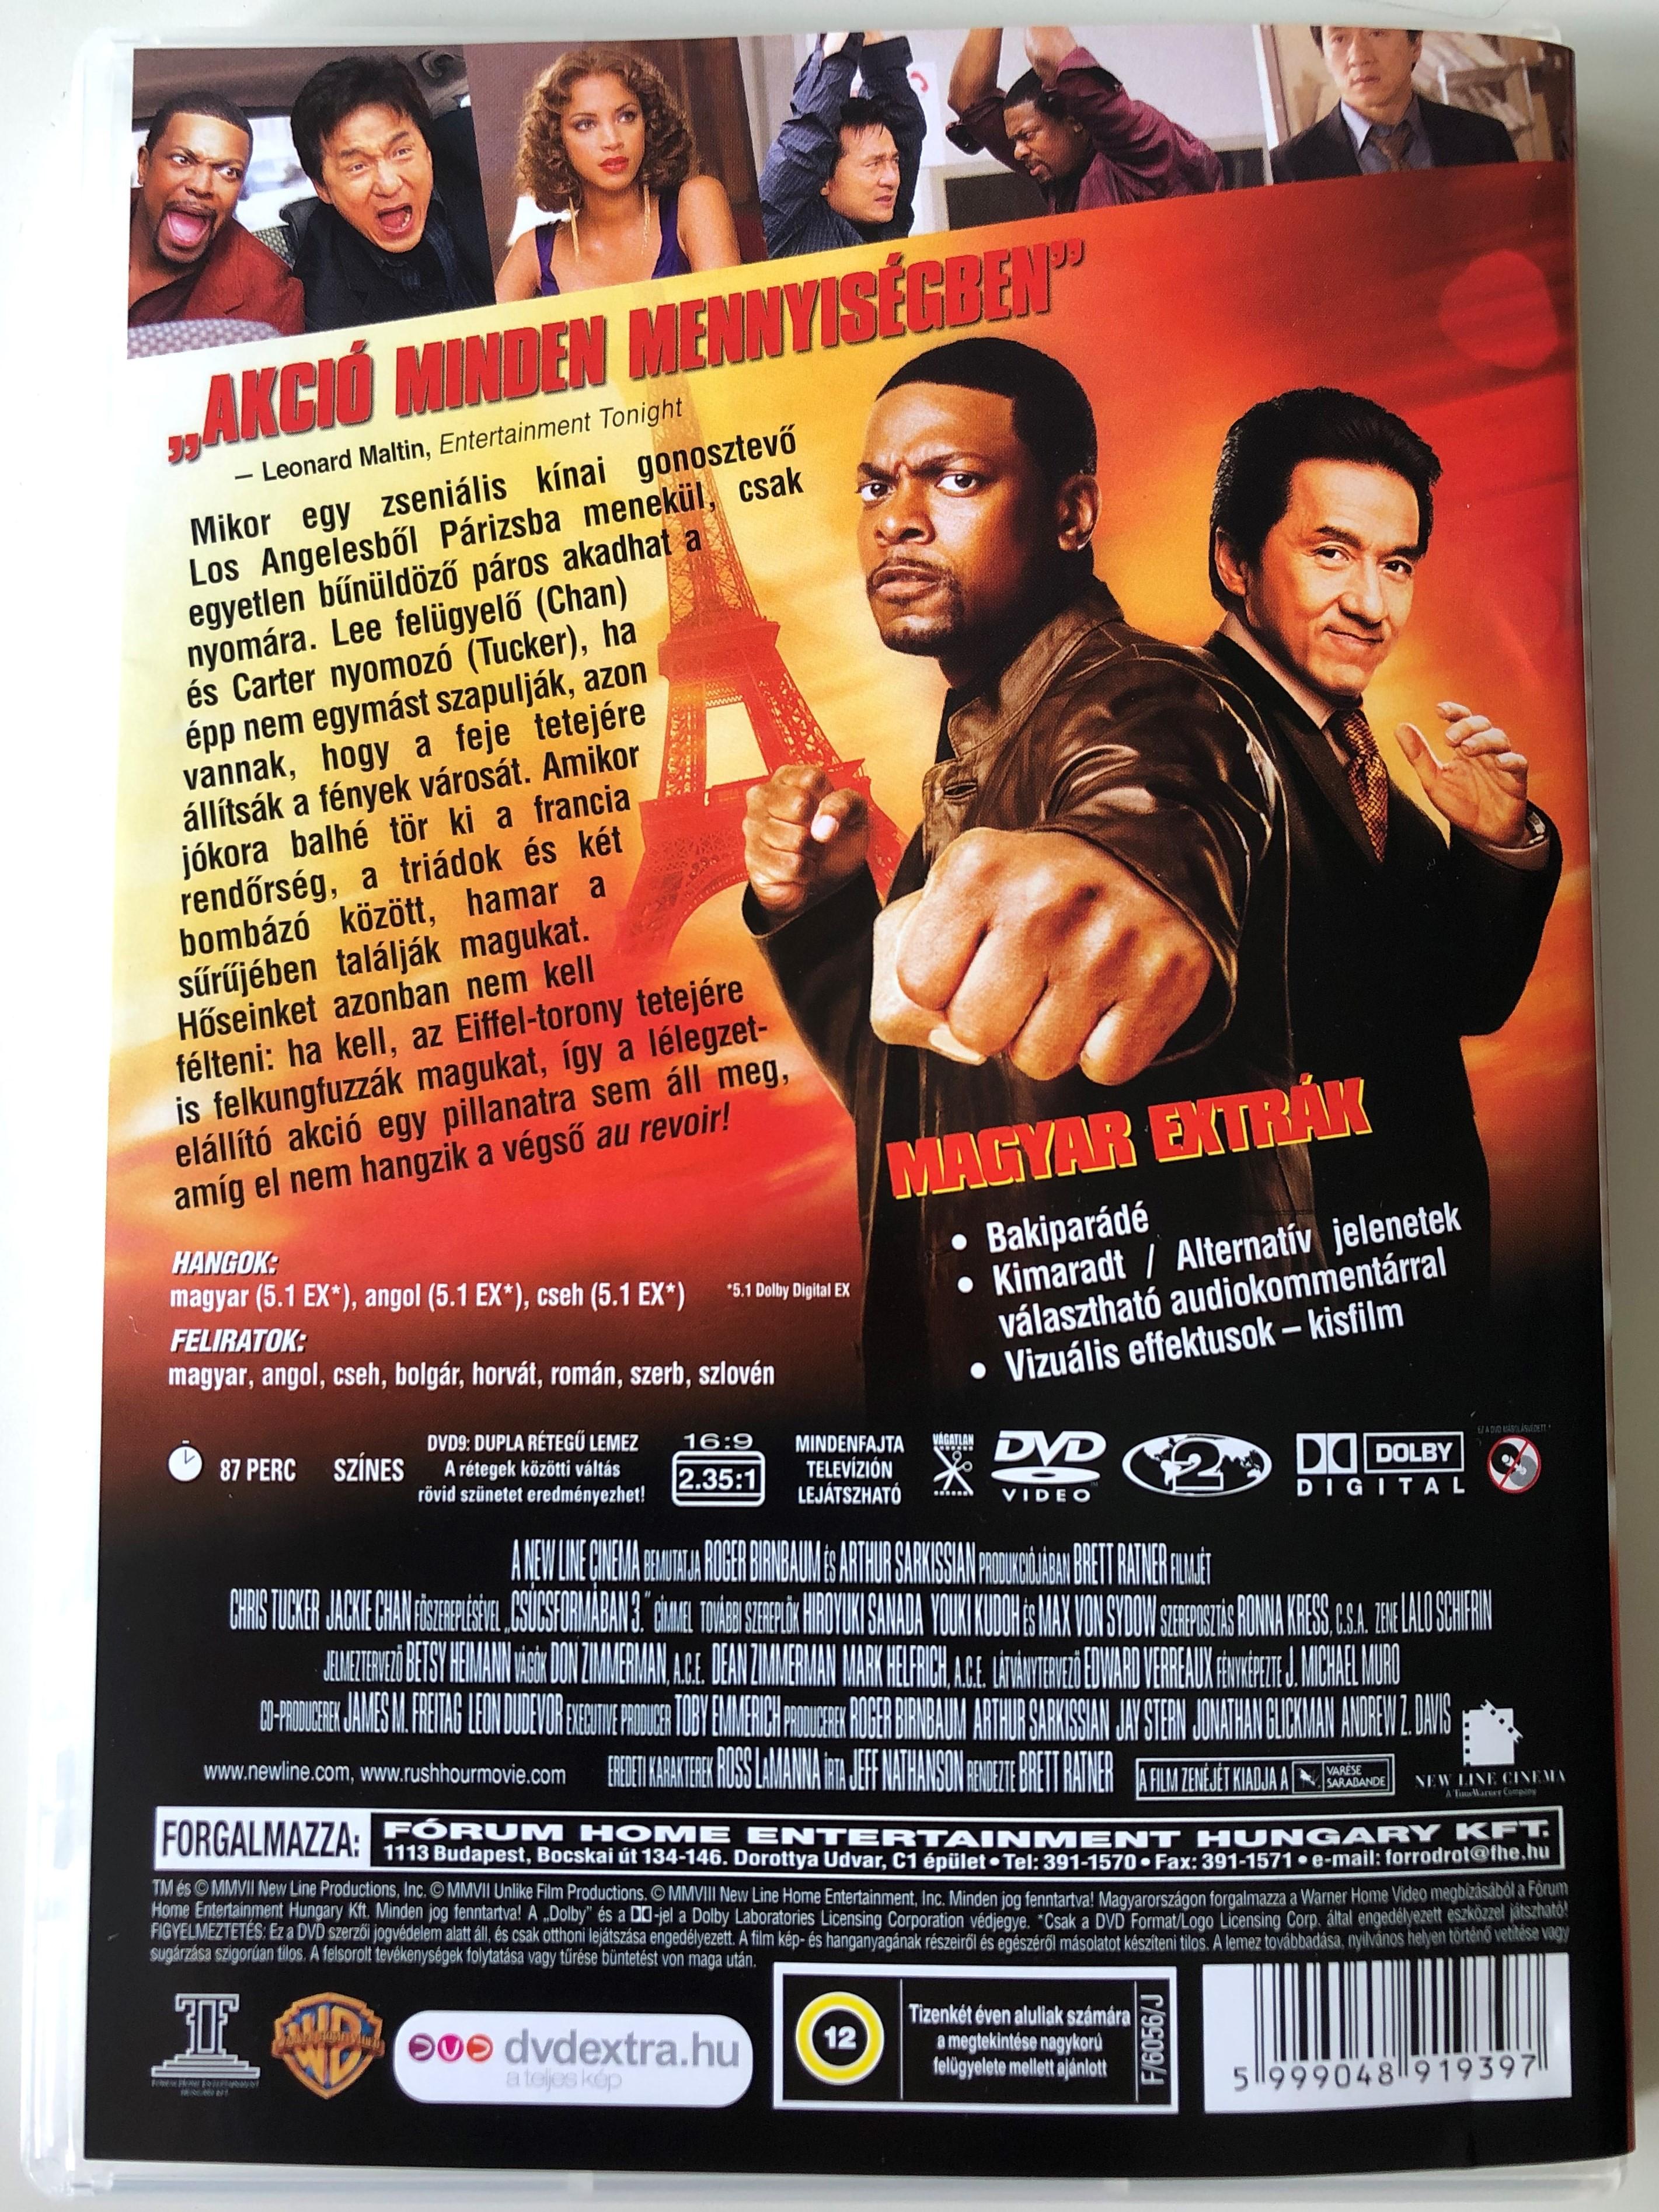 Rush Hour 3 Rush Hour 3 Jackie Chan Movies Rush Hour